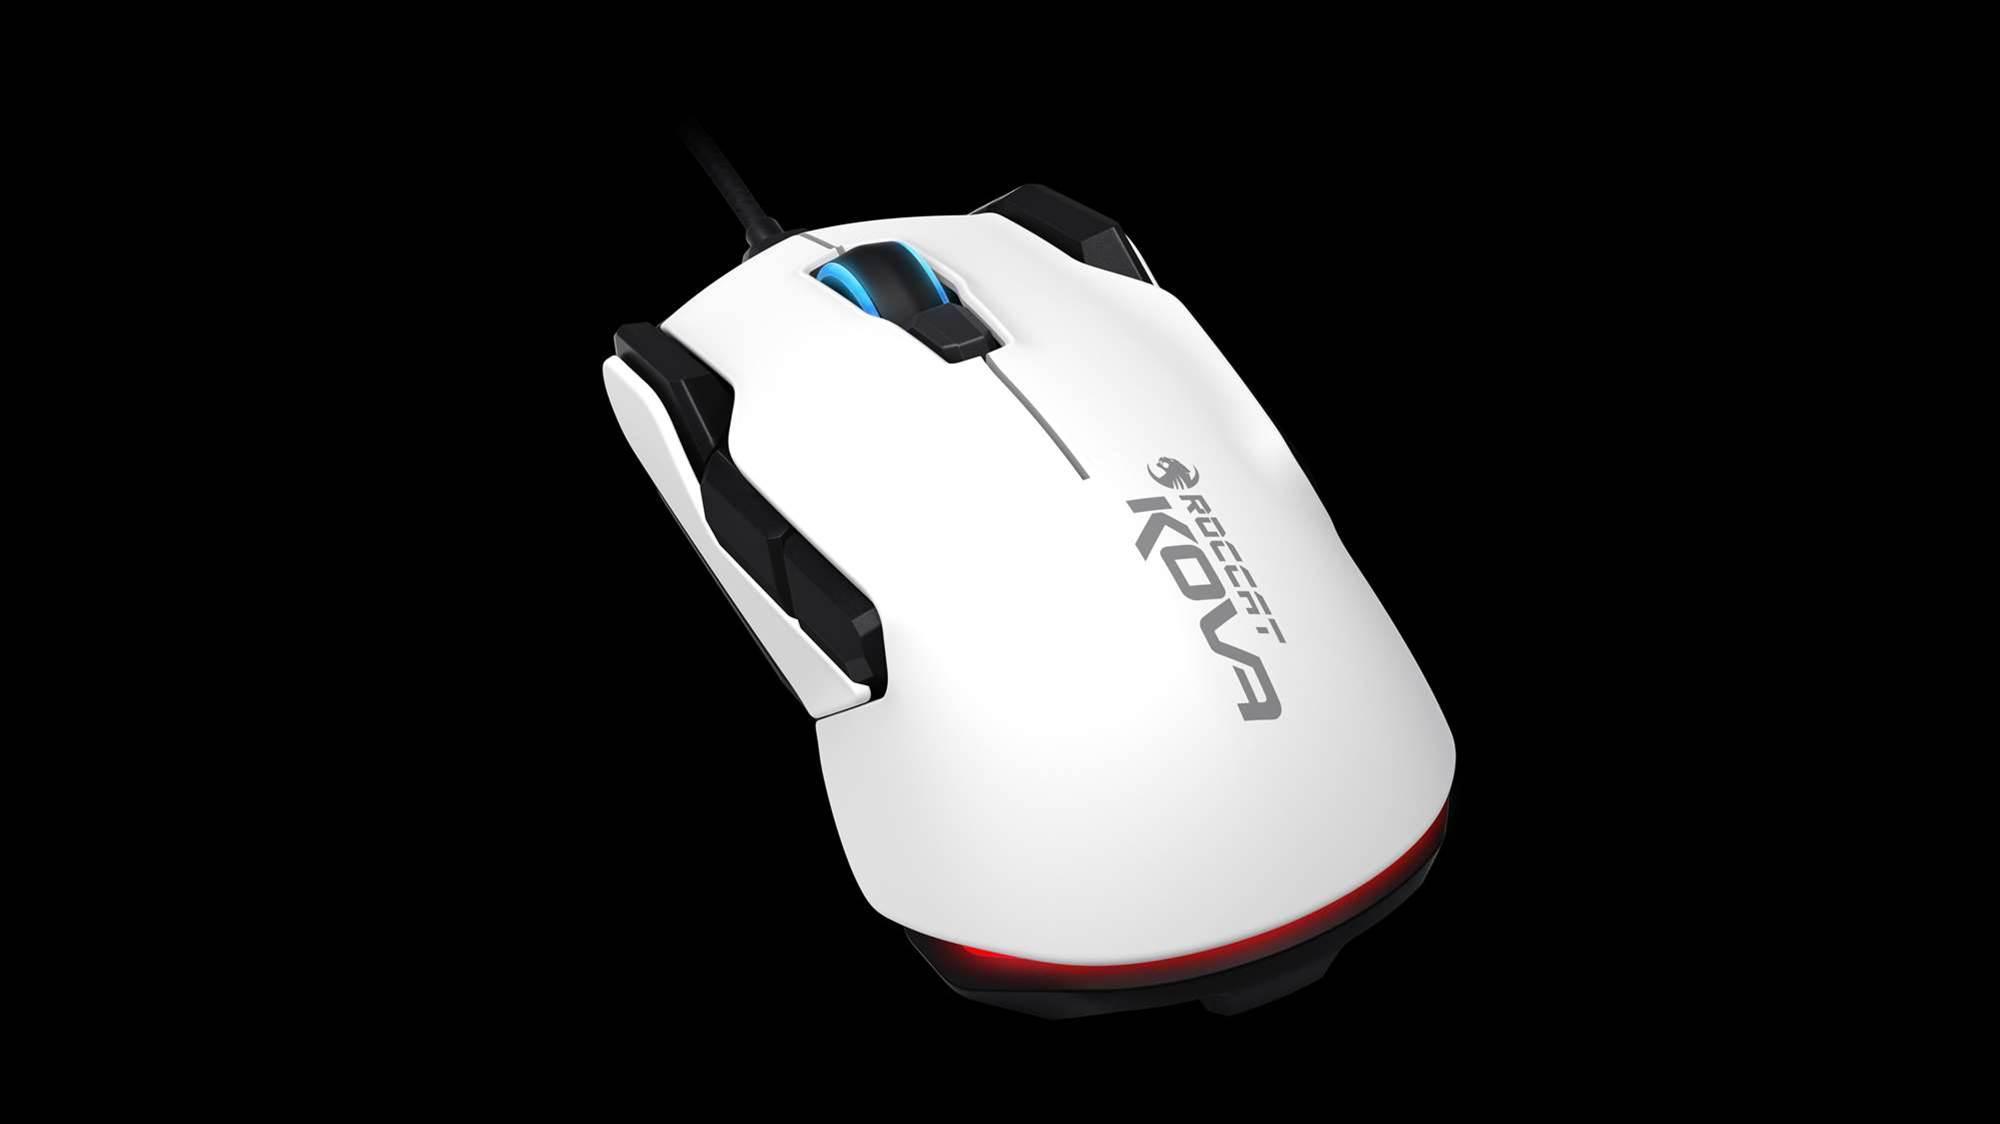 Roccat's new Kova mouse revealed